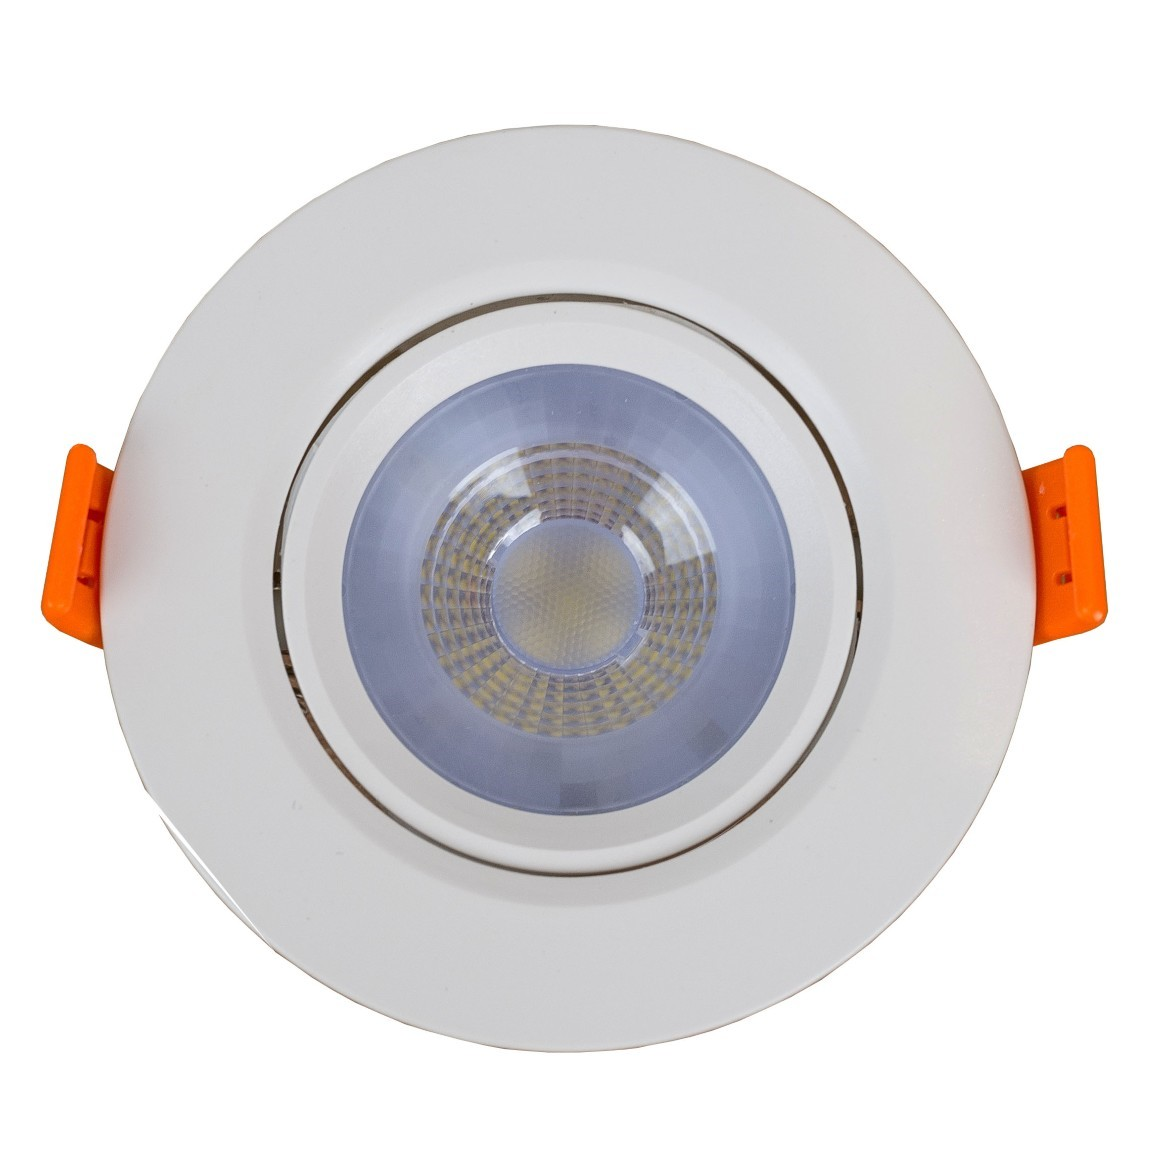 Spot LED Embutir ABS Redondo 7W Luz Amarela Bivolt - Llum